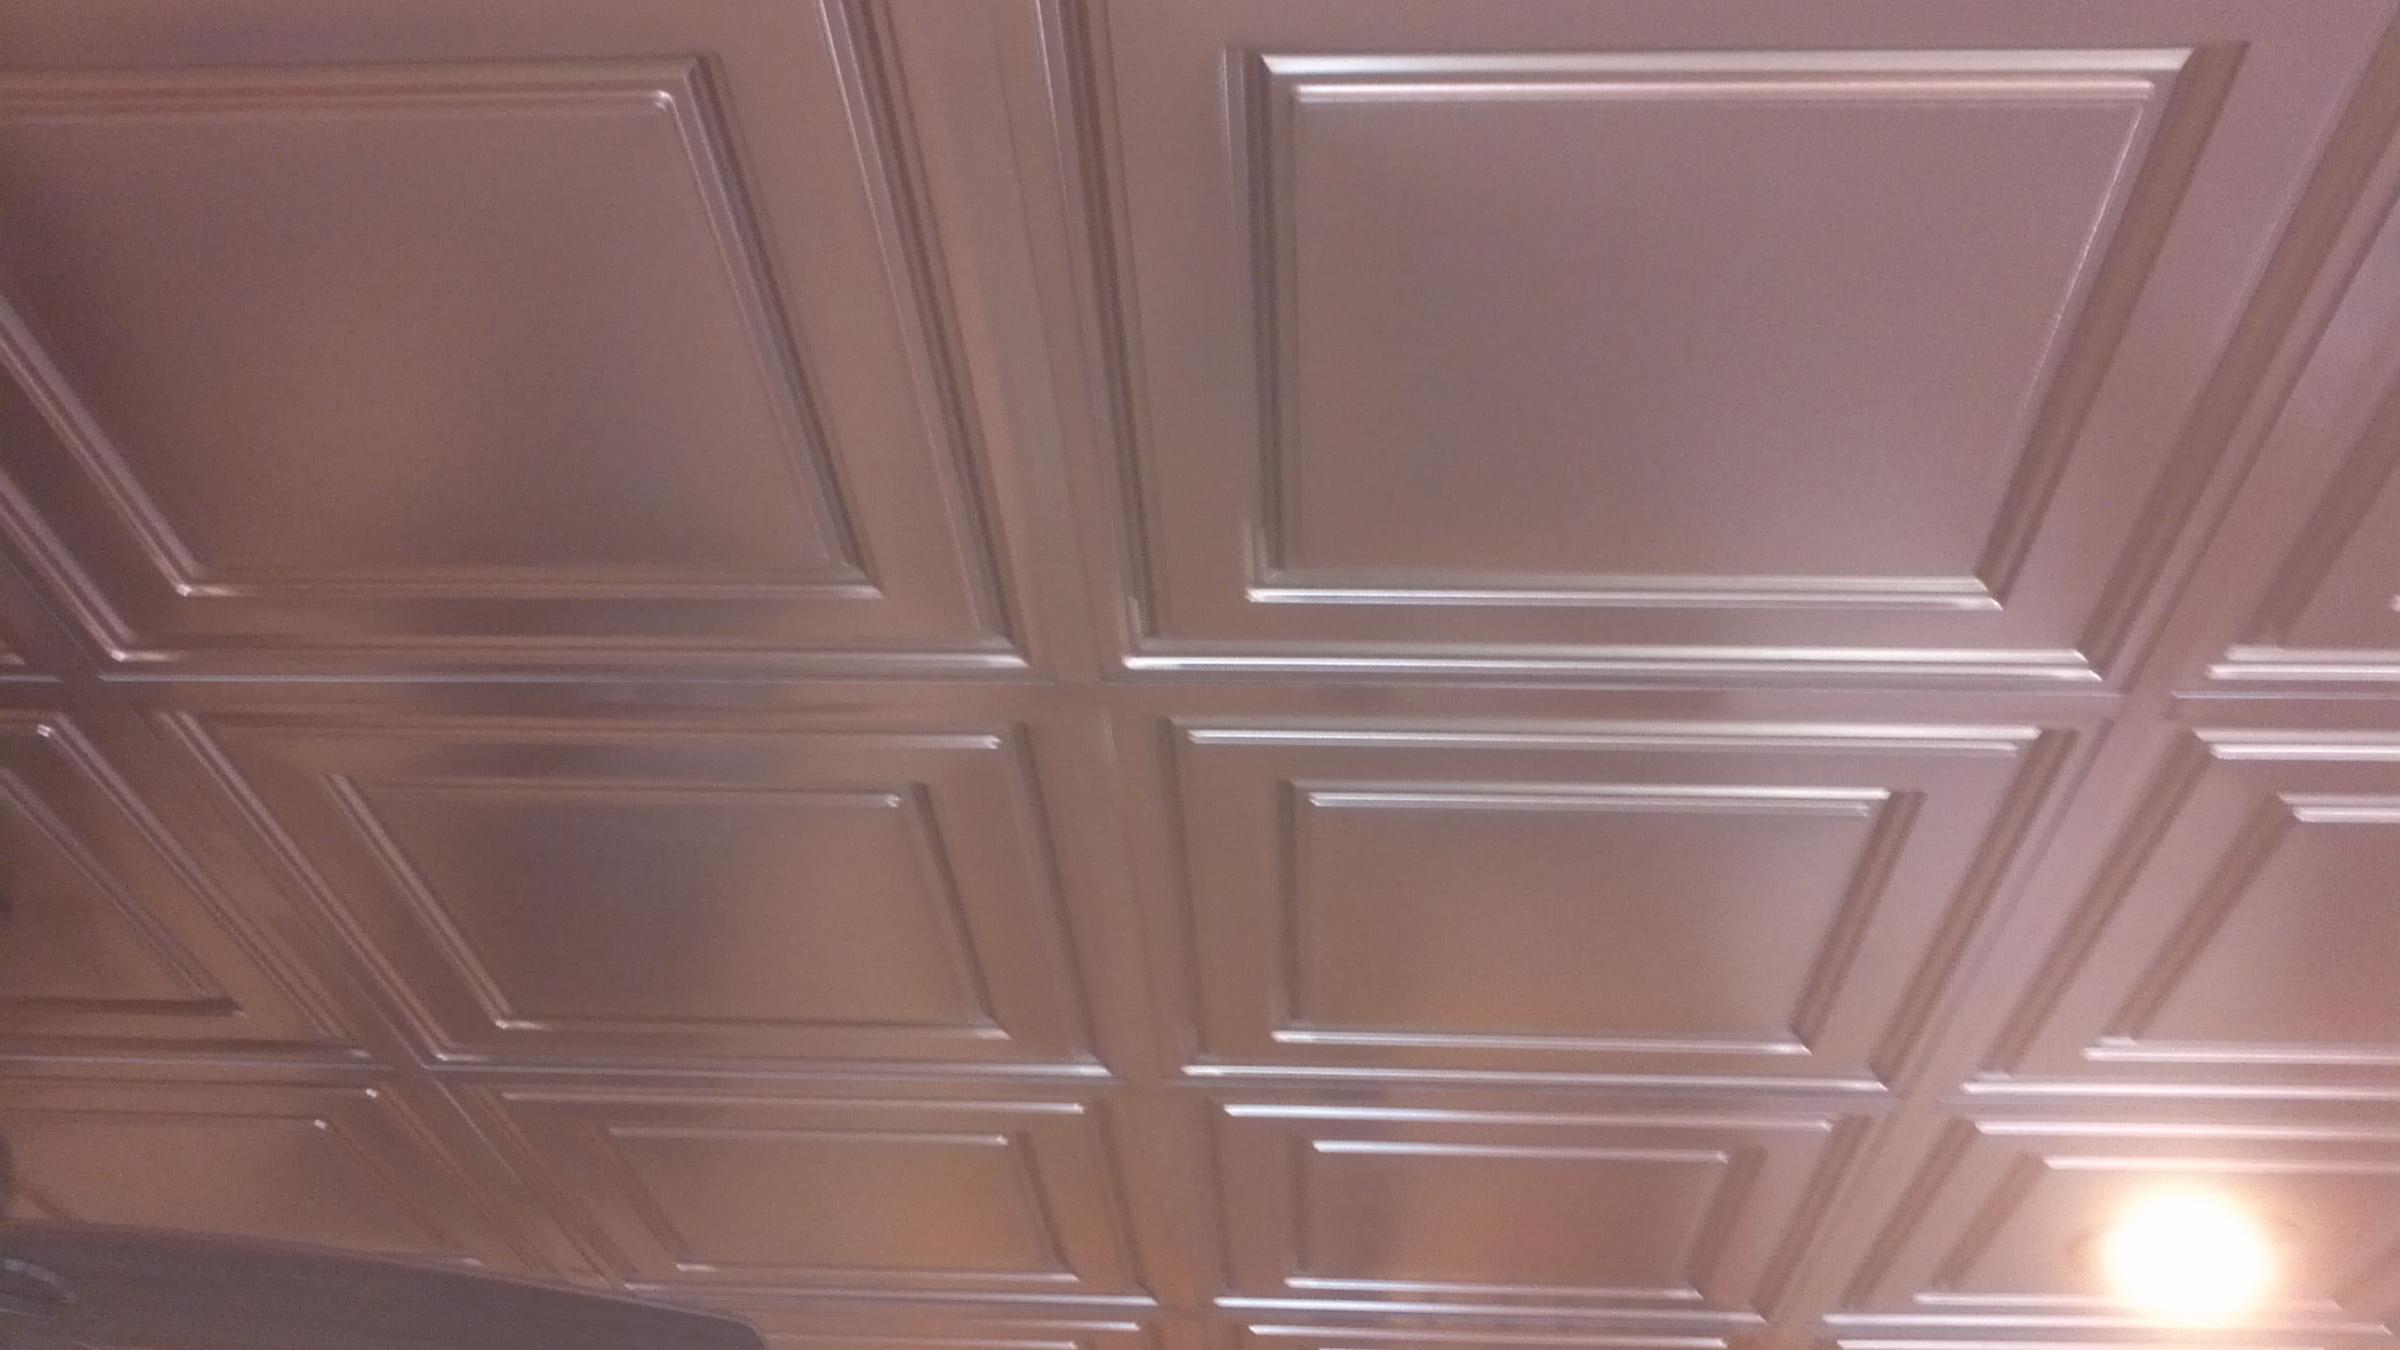 Glue up ceiling tiles-poole-ceiling.jpg